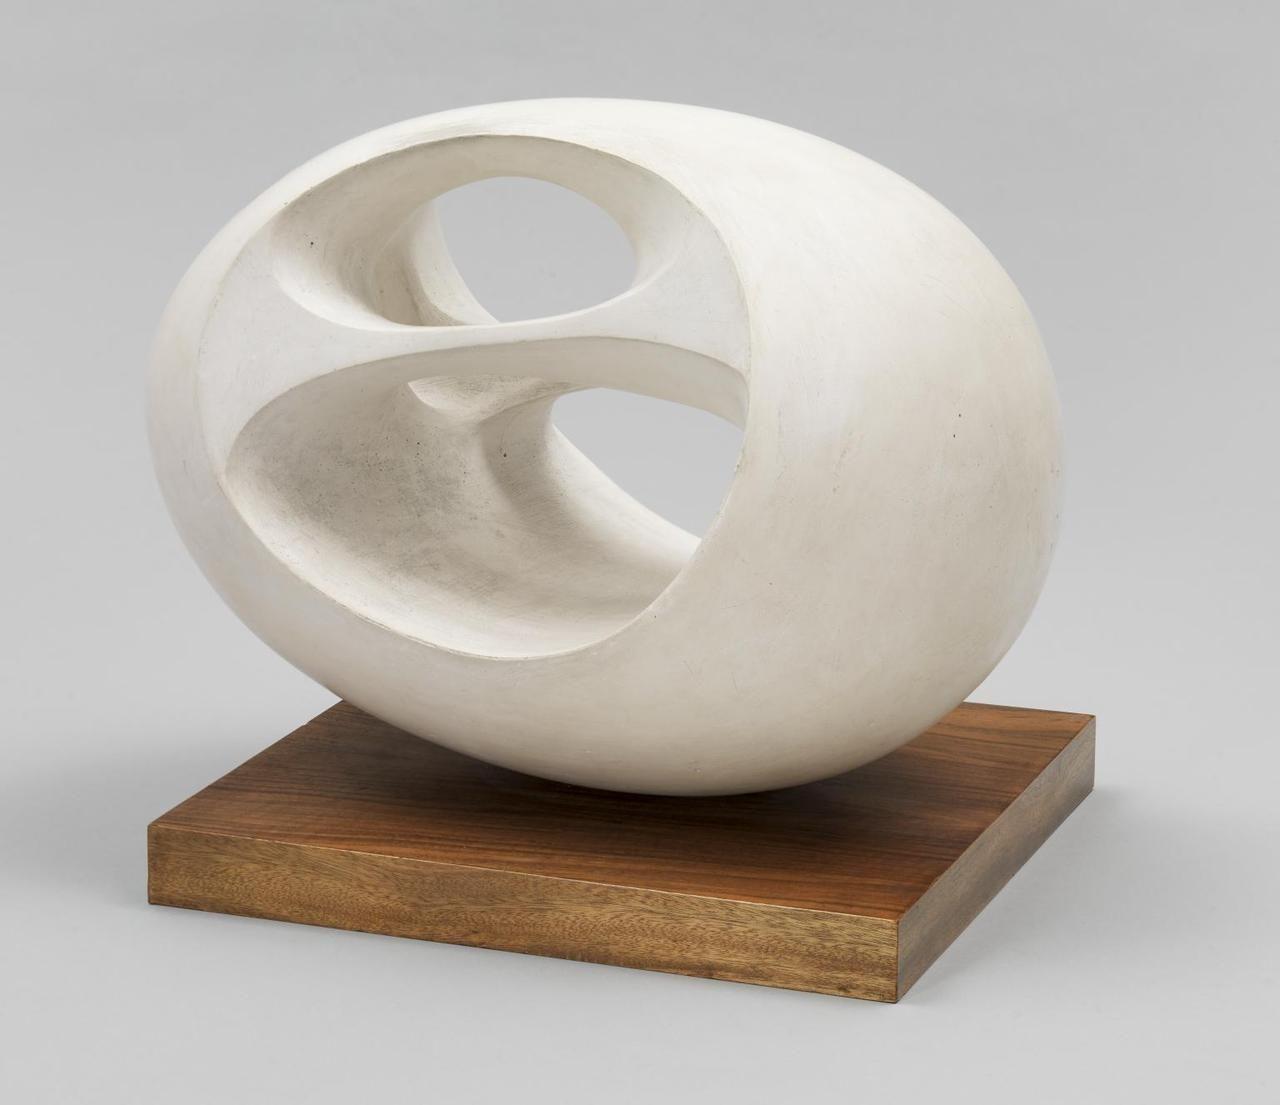 Barbara Hepworth, Oval Sculpture (No. 2)   Барбара хепуорт, Каменная скульптура, Скульптура